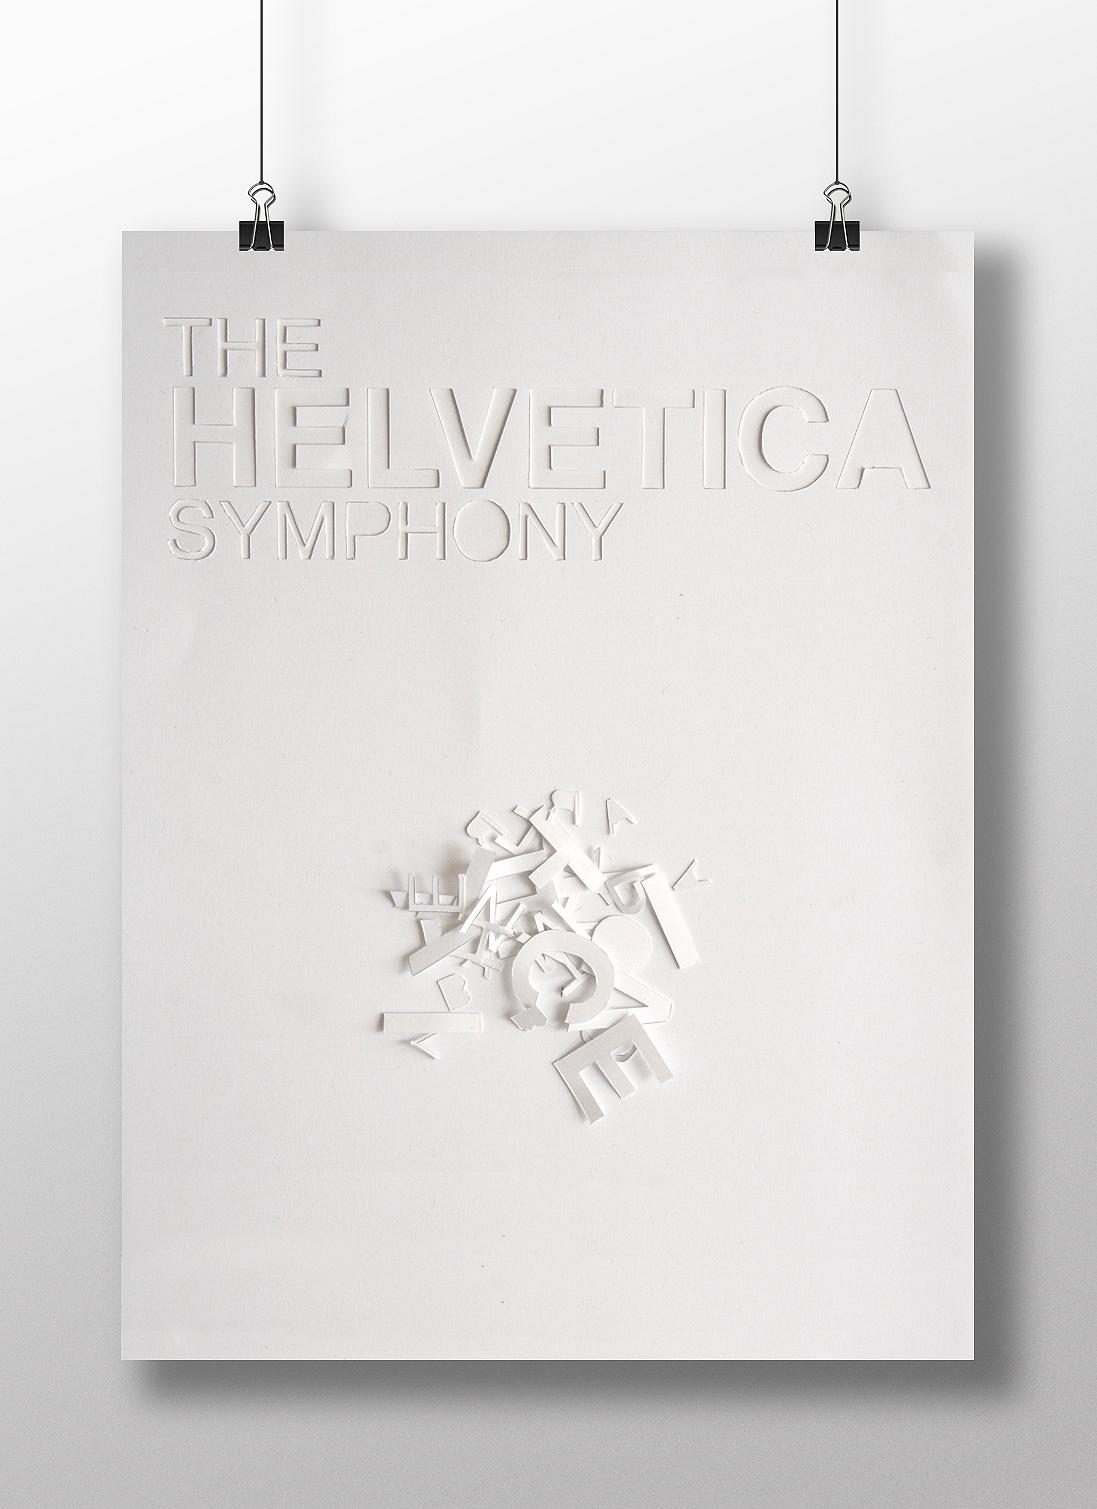 helvetica symphony